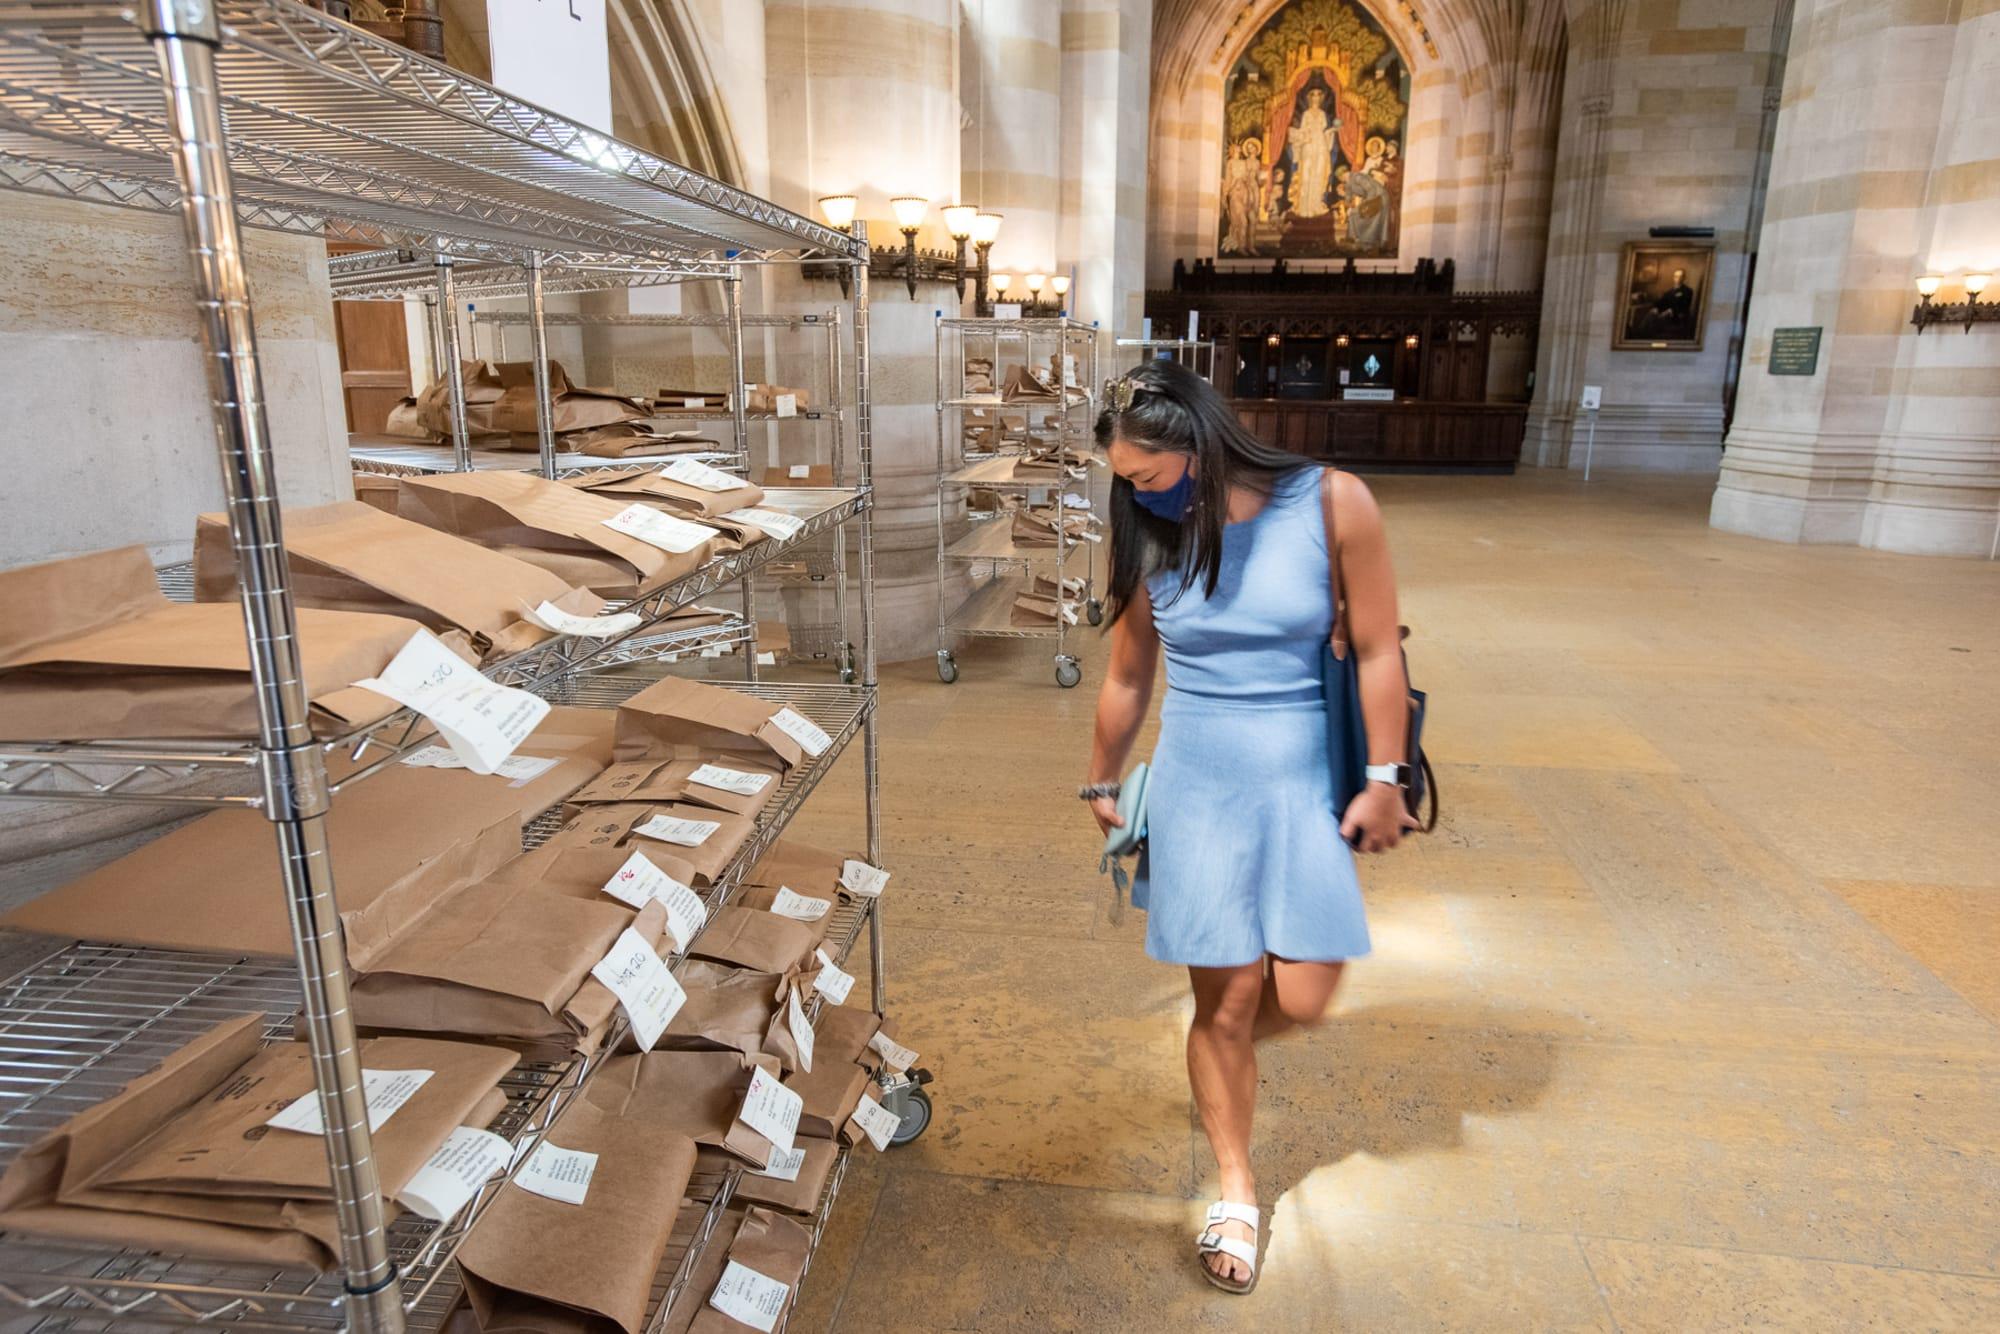 Woman in a blue dress looks at metal racks of brown paper bags in Sterling nave.